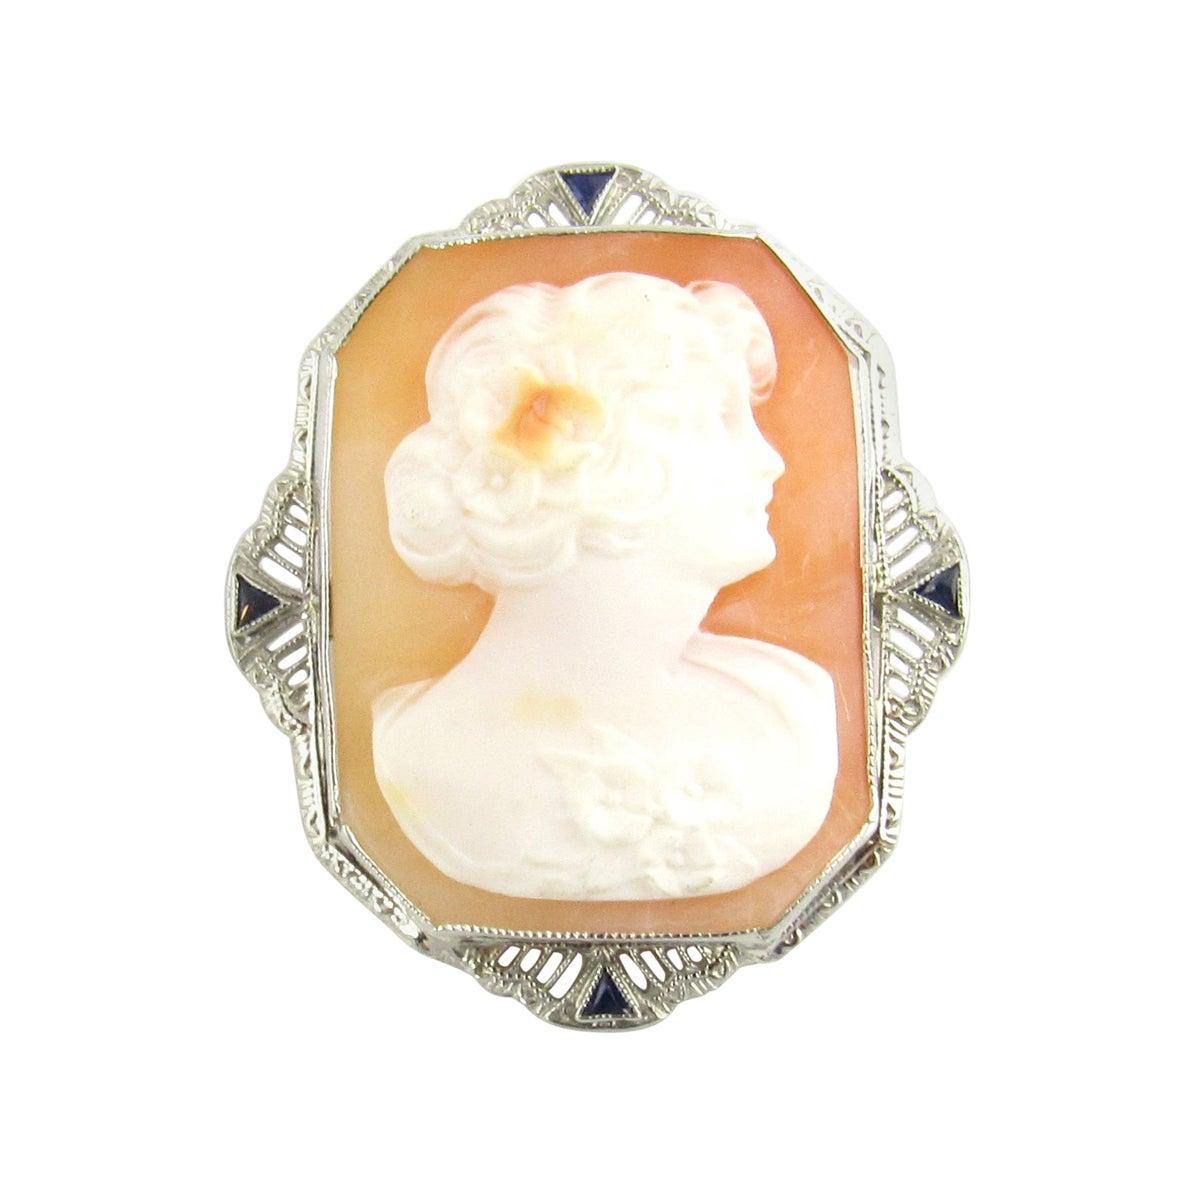 14 Karat White Gold Cameo Brooch / Pendant